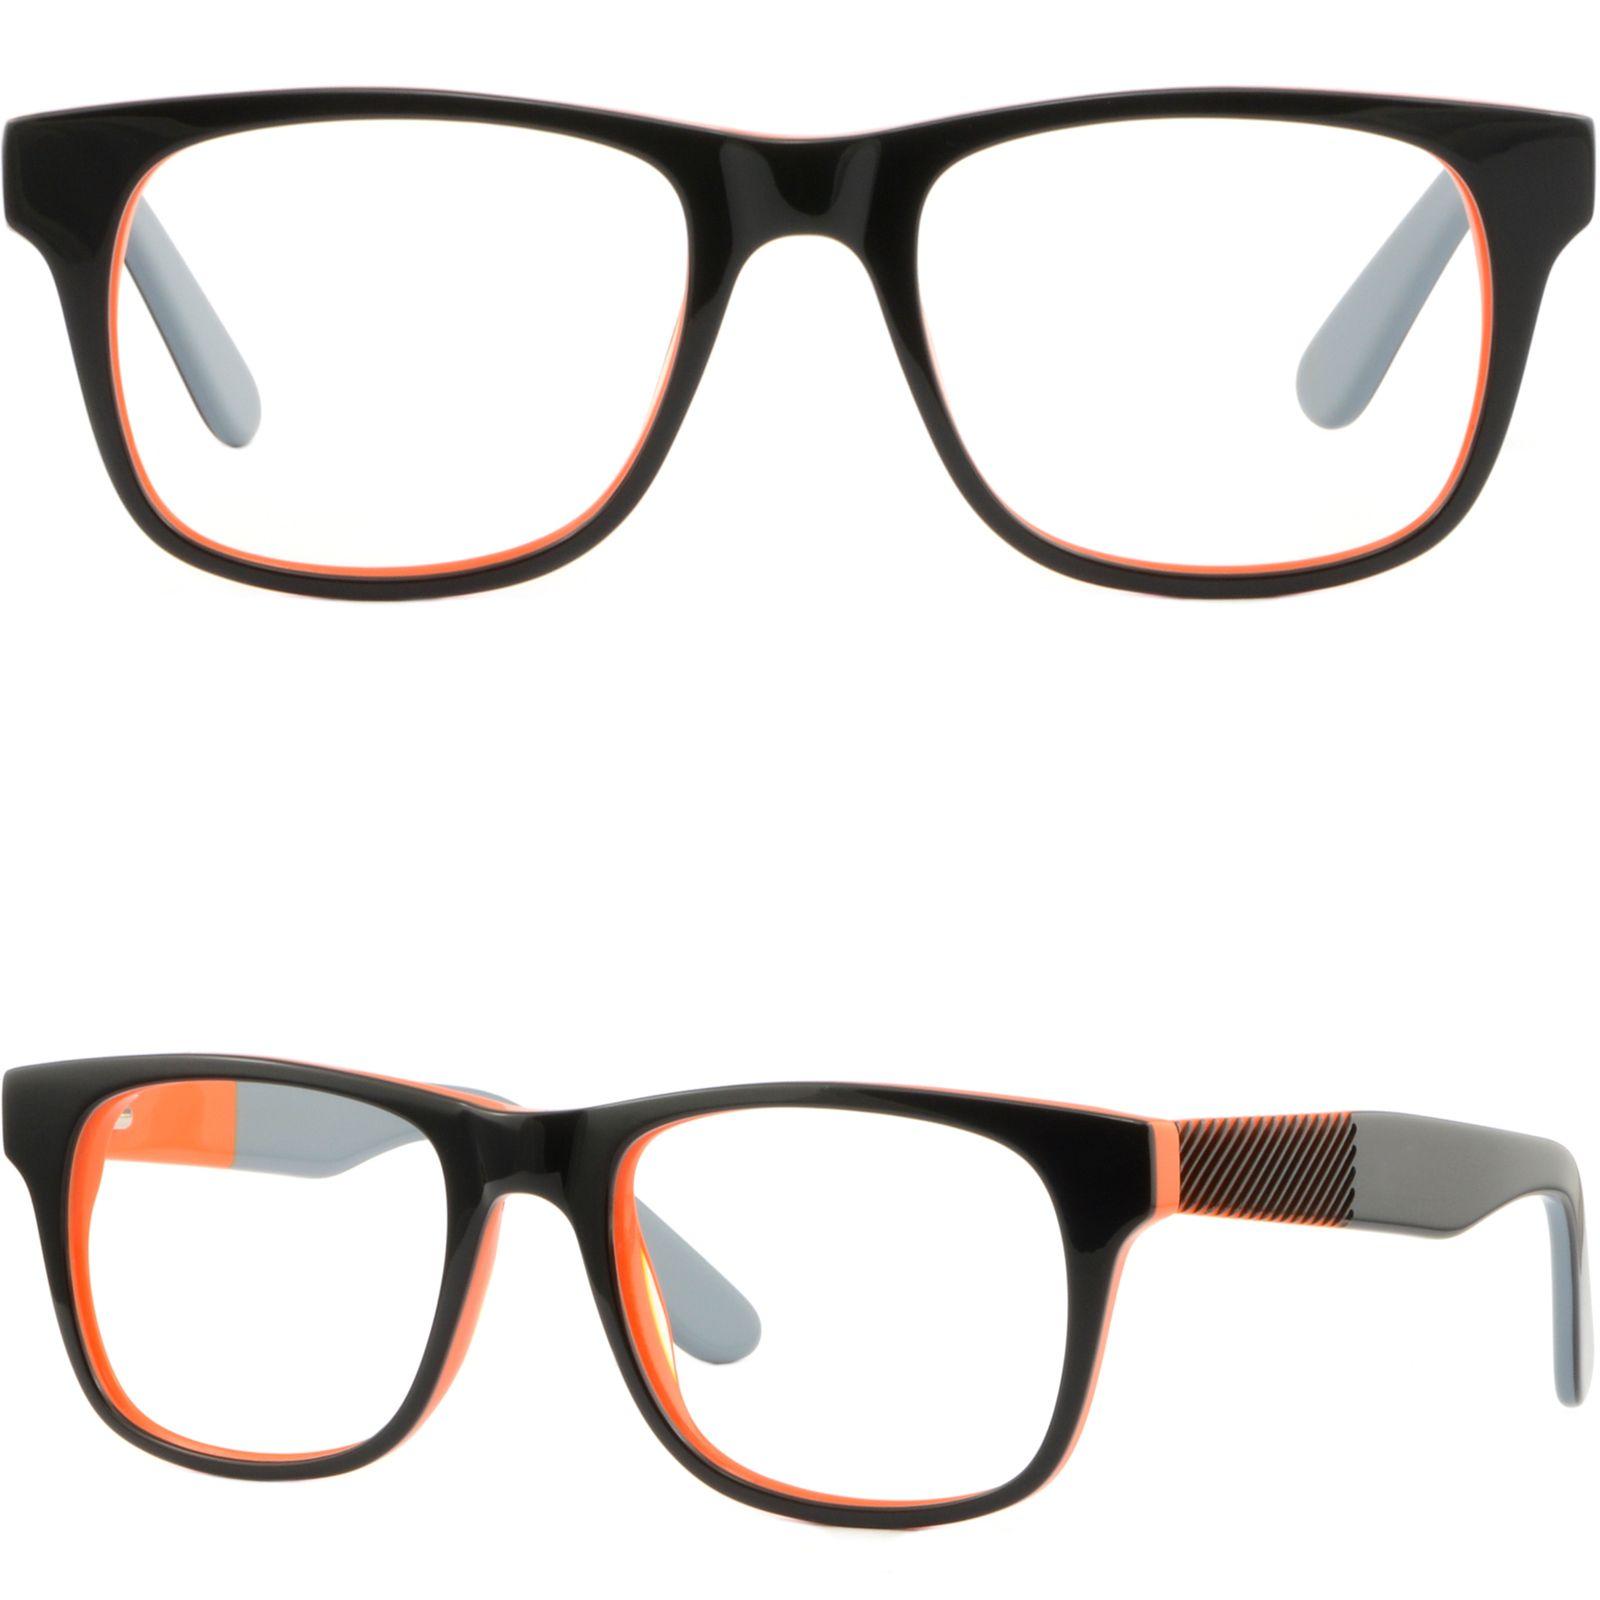 Compre Large Square Men Women Frame Gafas Graduadas Brazos Gruesos ...